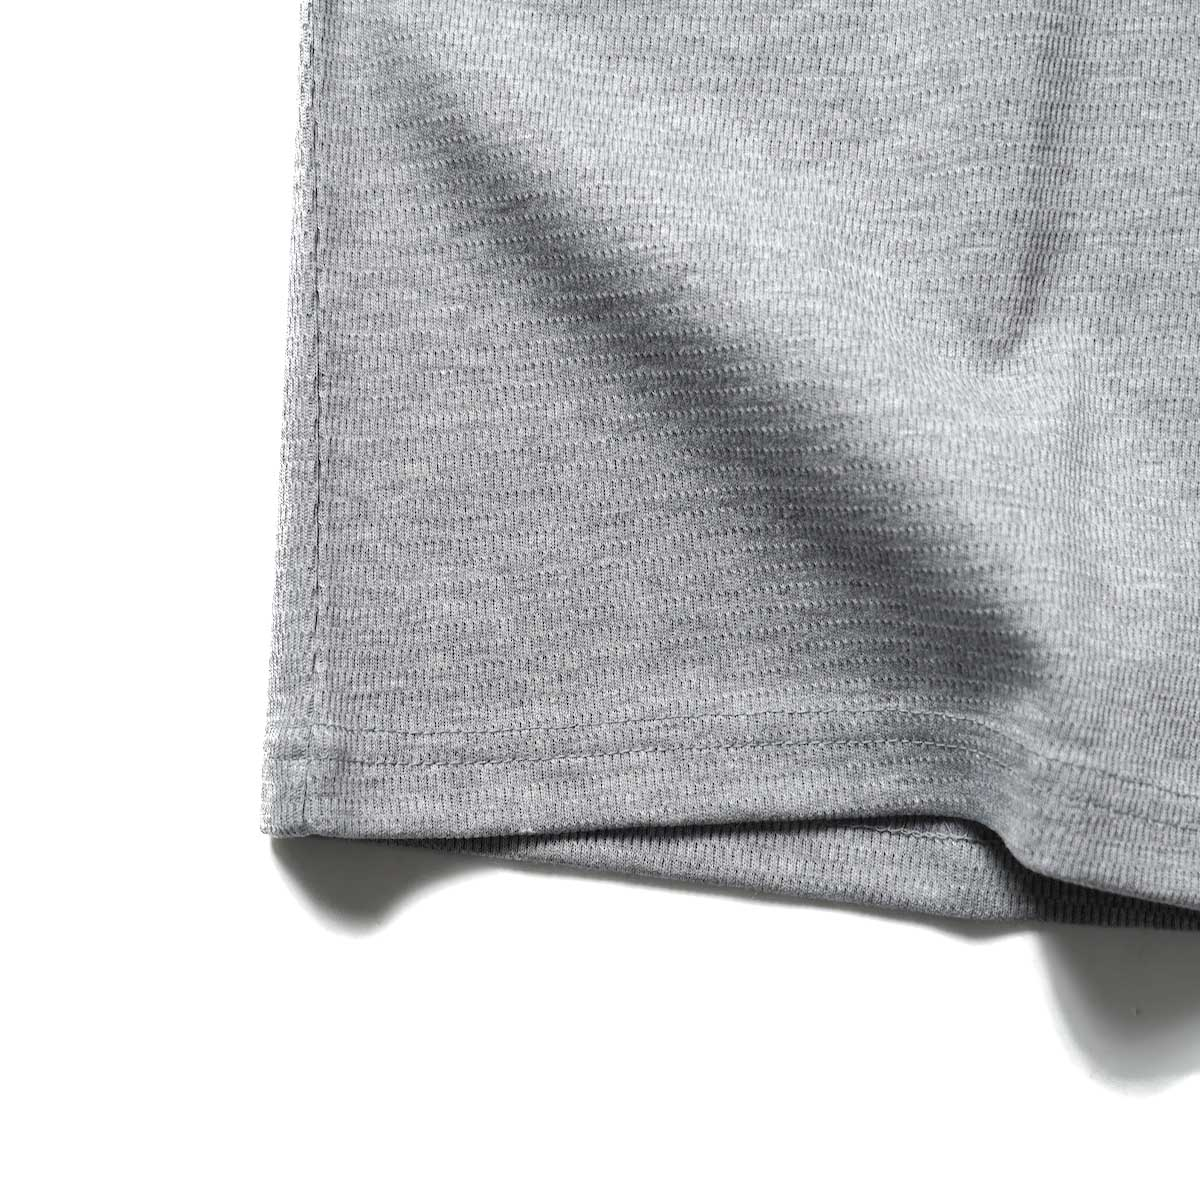 FUTURE PRIMITIVE / FP THERMAL V T-SHIRT (Gray)裾